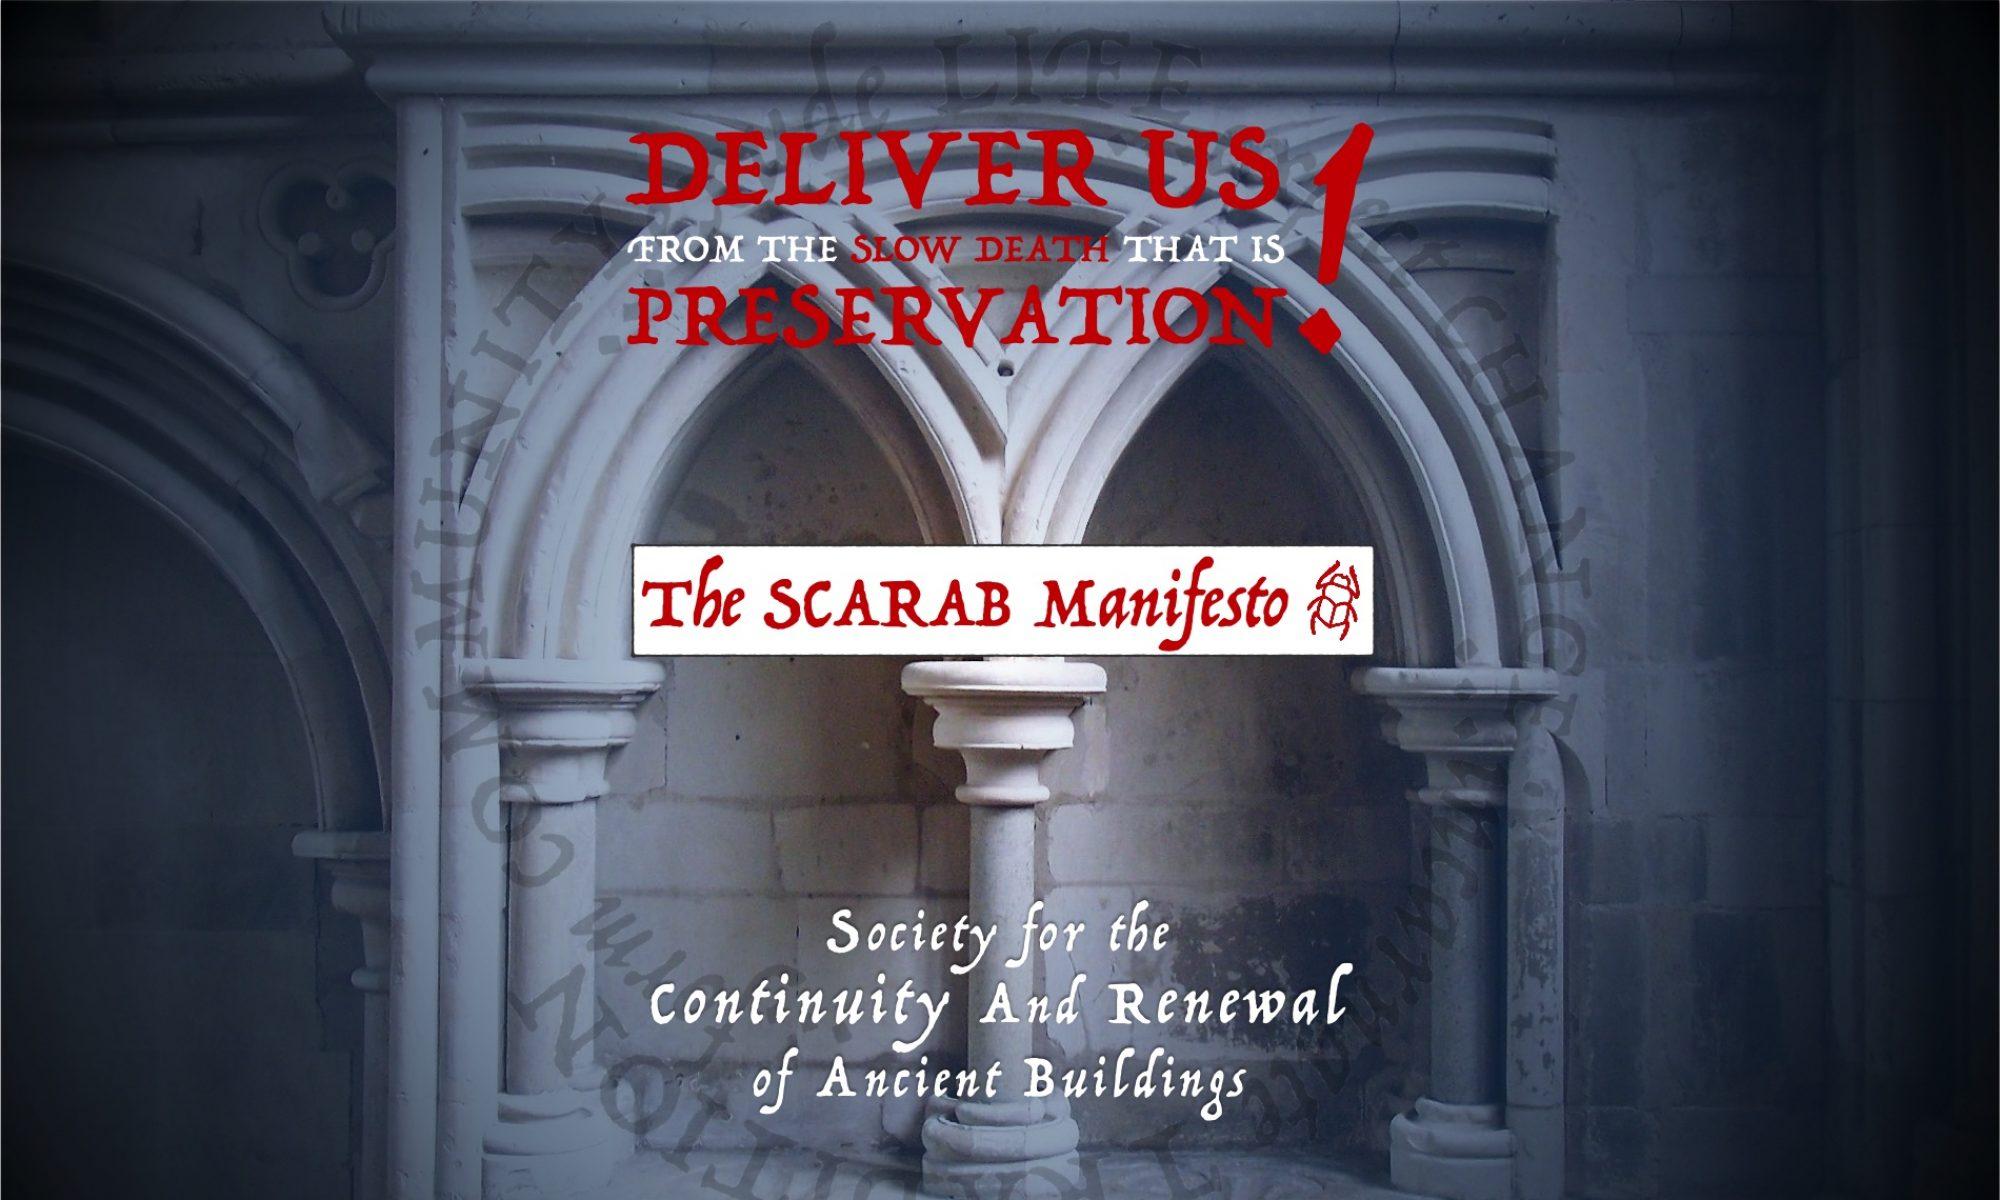 SCARAB Manifesto